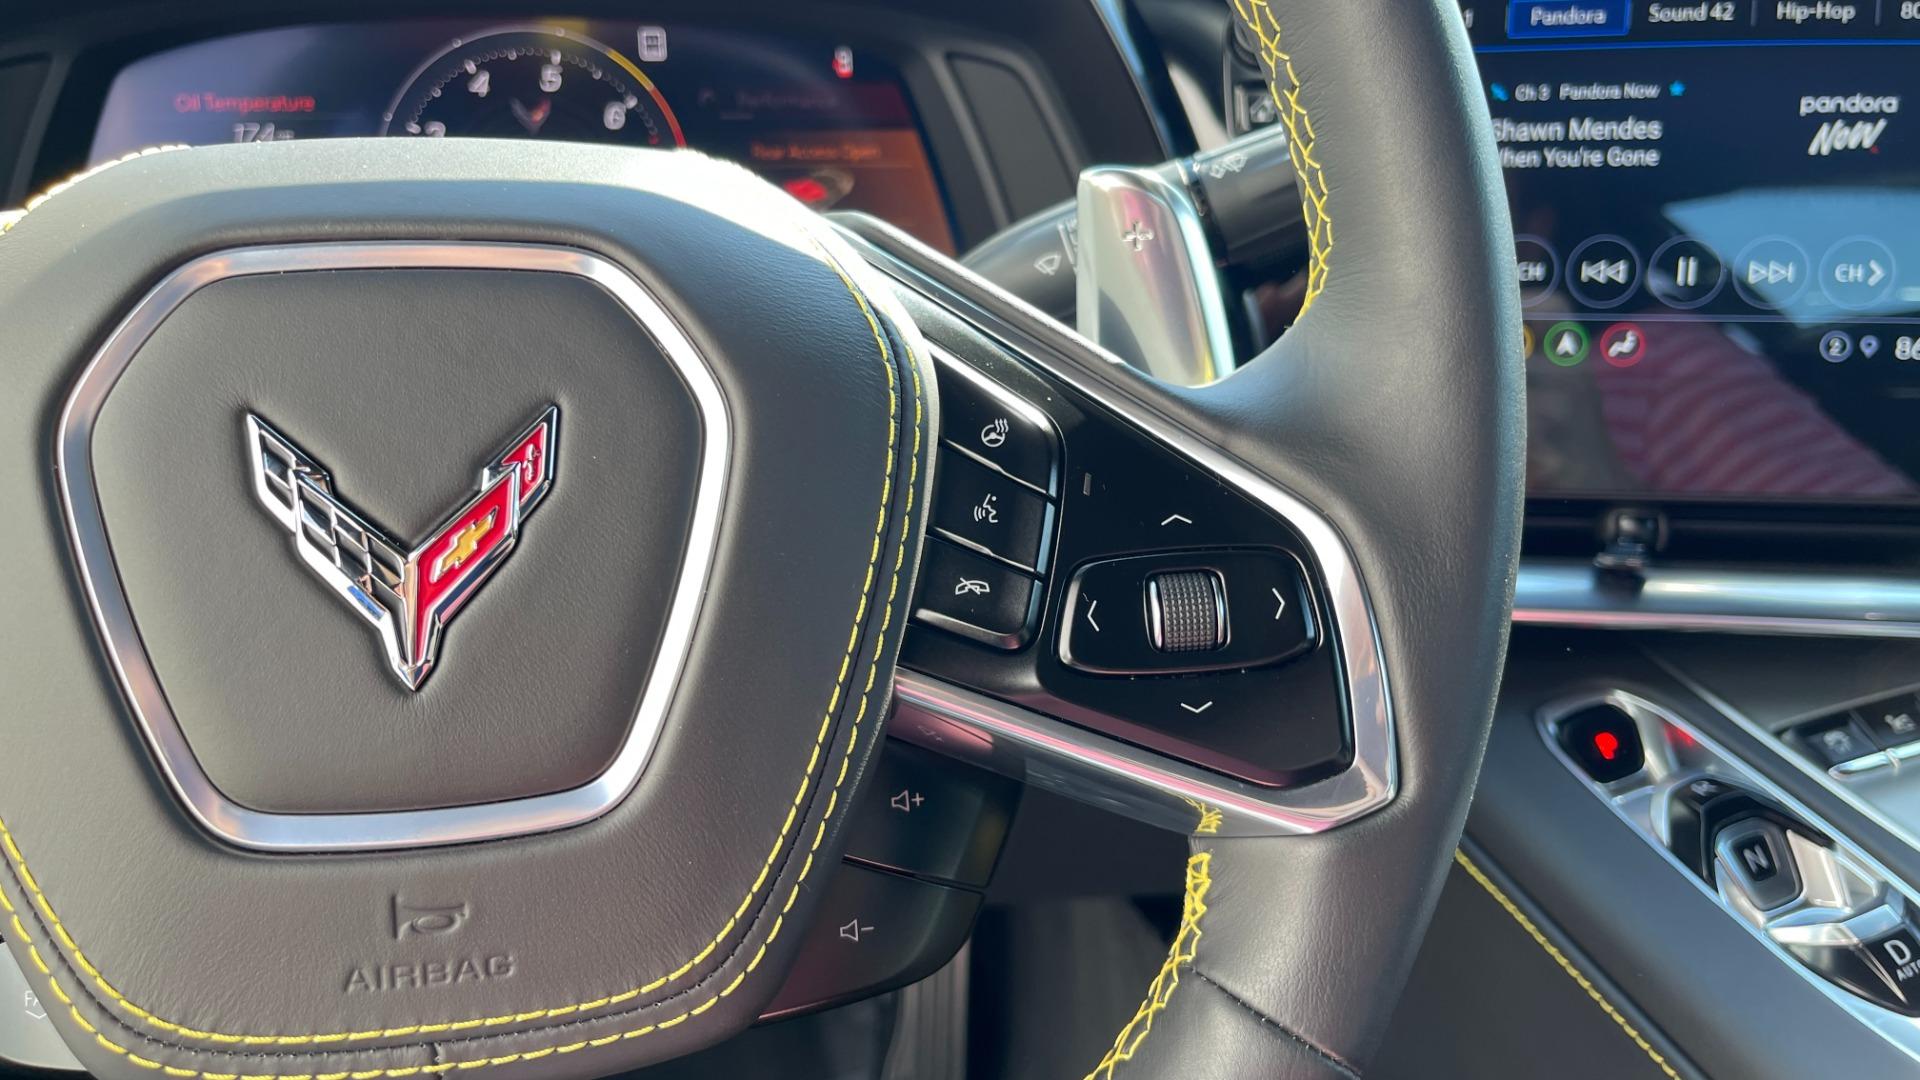 Used 2021 Chevrolet CORVETTE STINGRAY 3LT COUPE / 8-SPD / PERF PKG / NAV / BOSE / REARVIEW for sale $110,995 at Formula Imports in Charlotte NC 28227 32